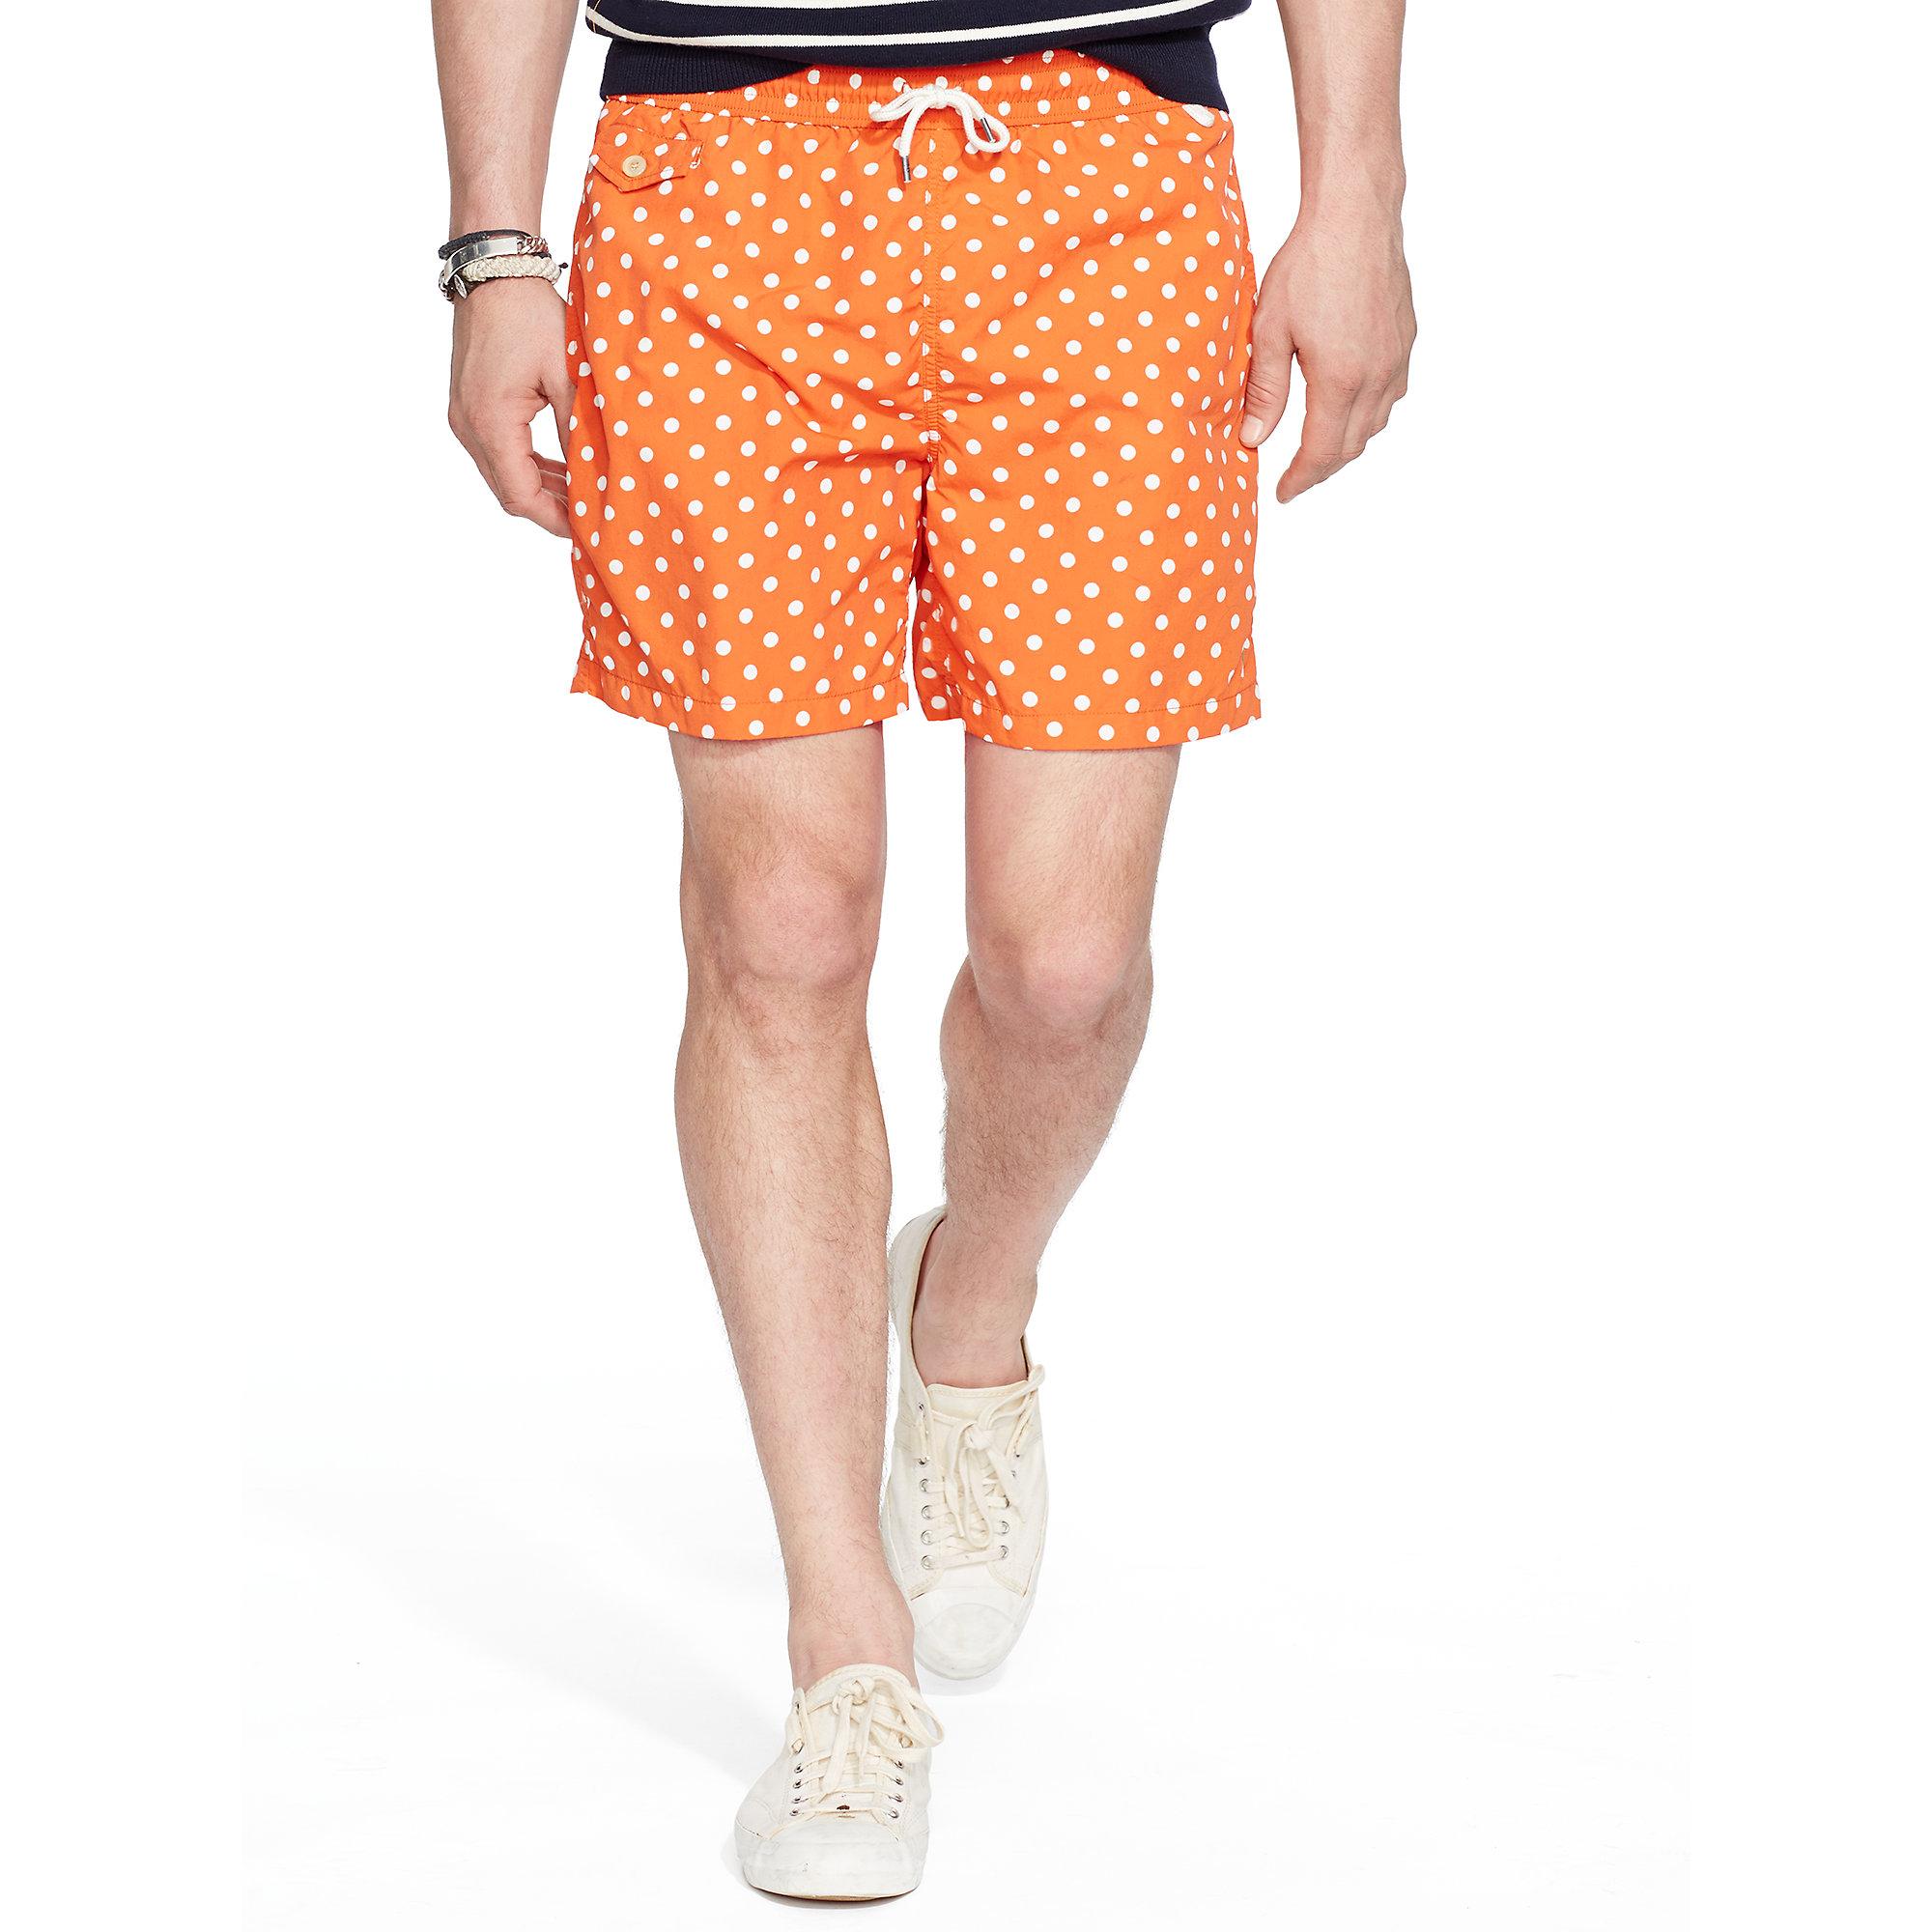 6a934118f412 cheapest ralph lauren mens shorts polo richardclason a1403 ca3c7  promo  code for lyst polo ralph lauren 6 polka dot traveler trunk in orange for men